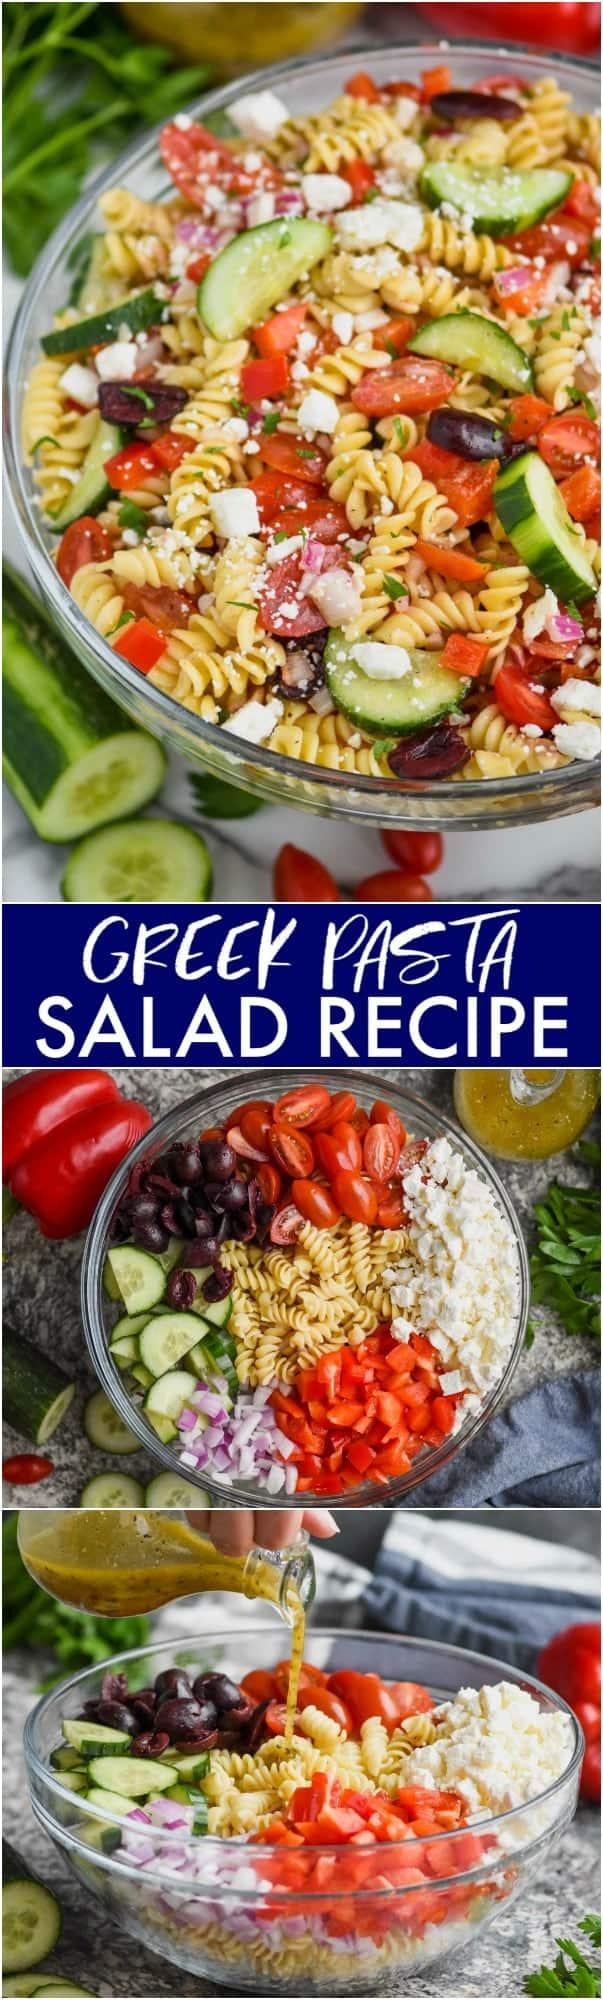 collage of photos of greek pasta salad